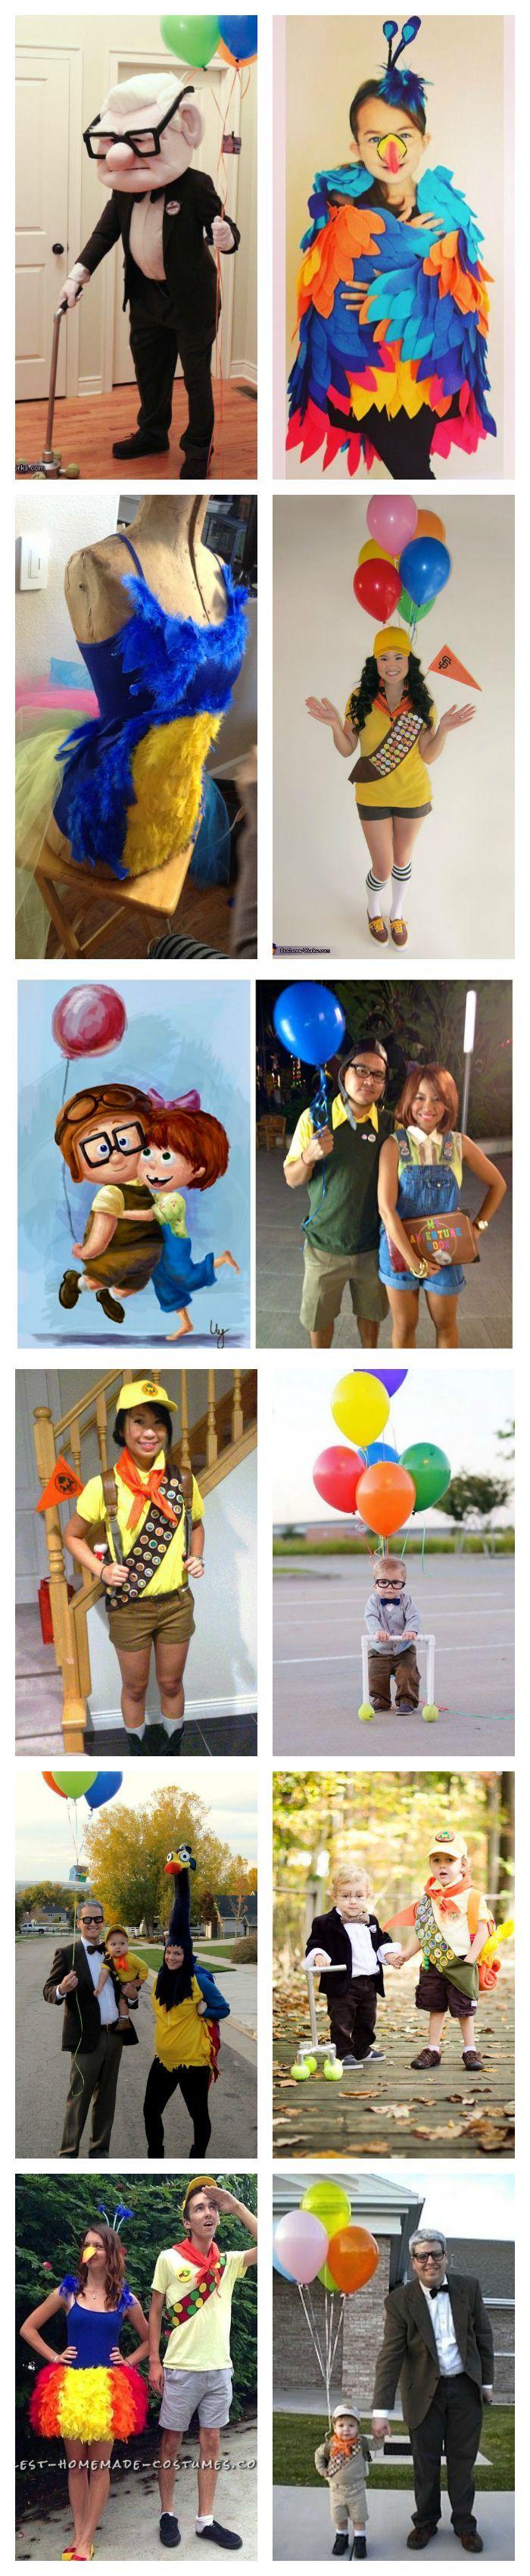 Disney Pixar Up Costume inspiration                                                                                                                                                                                 More